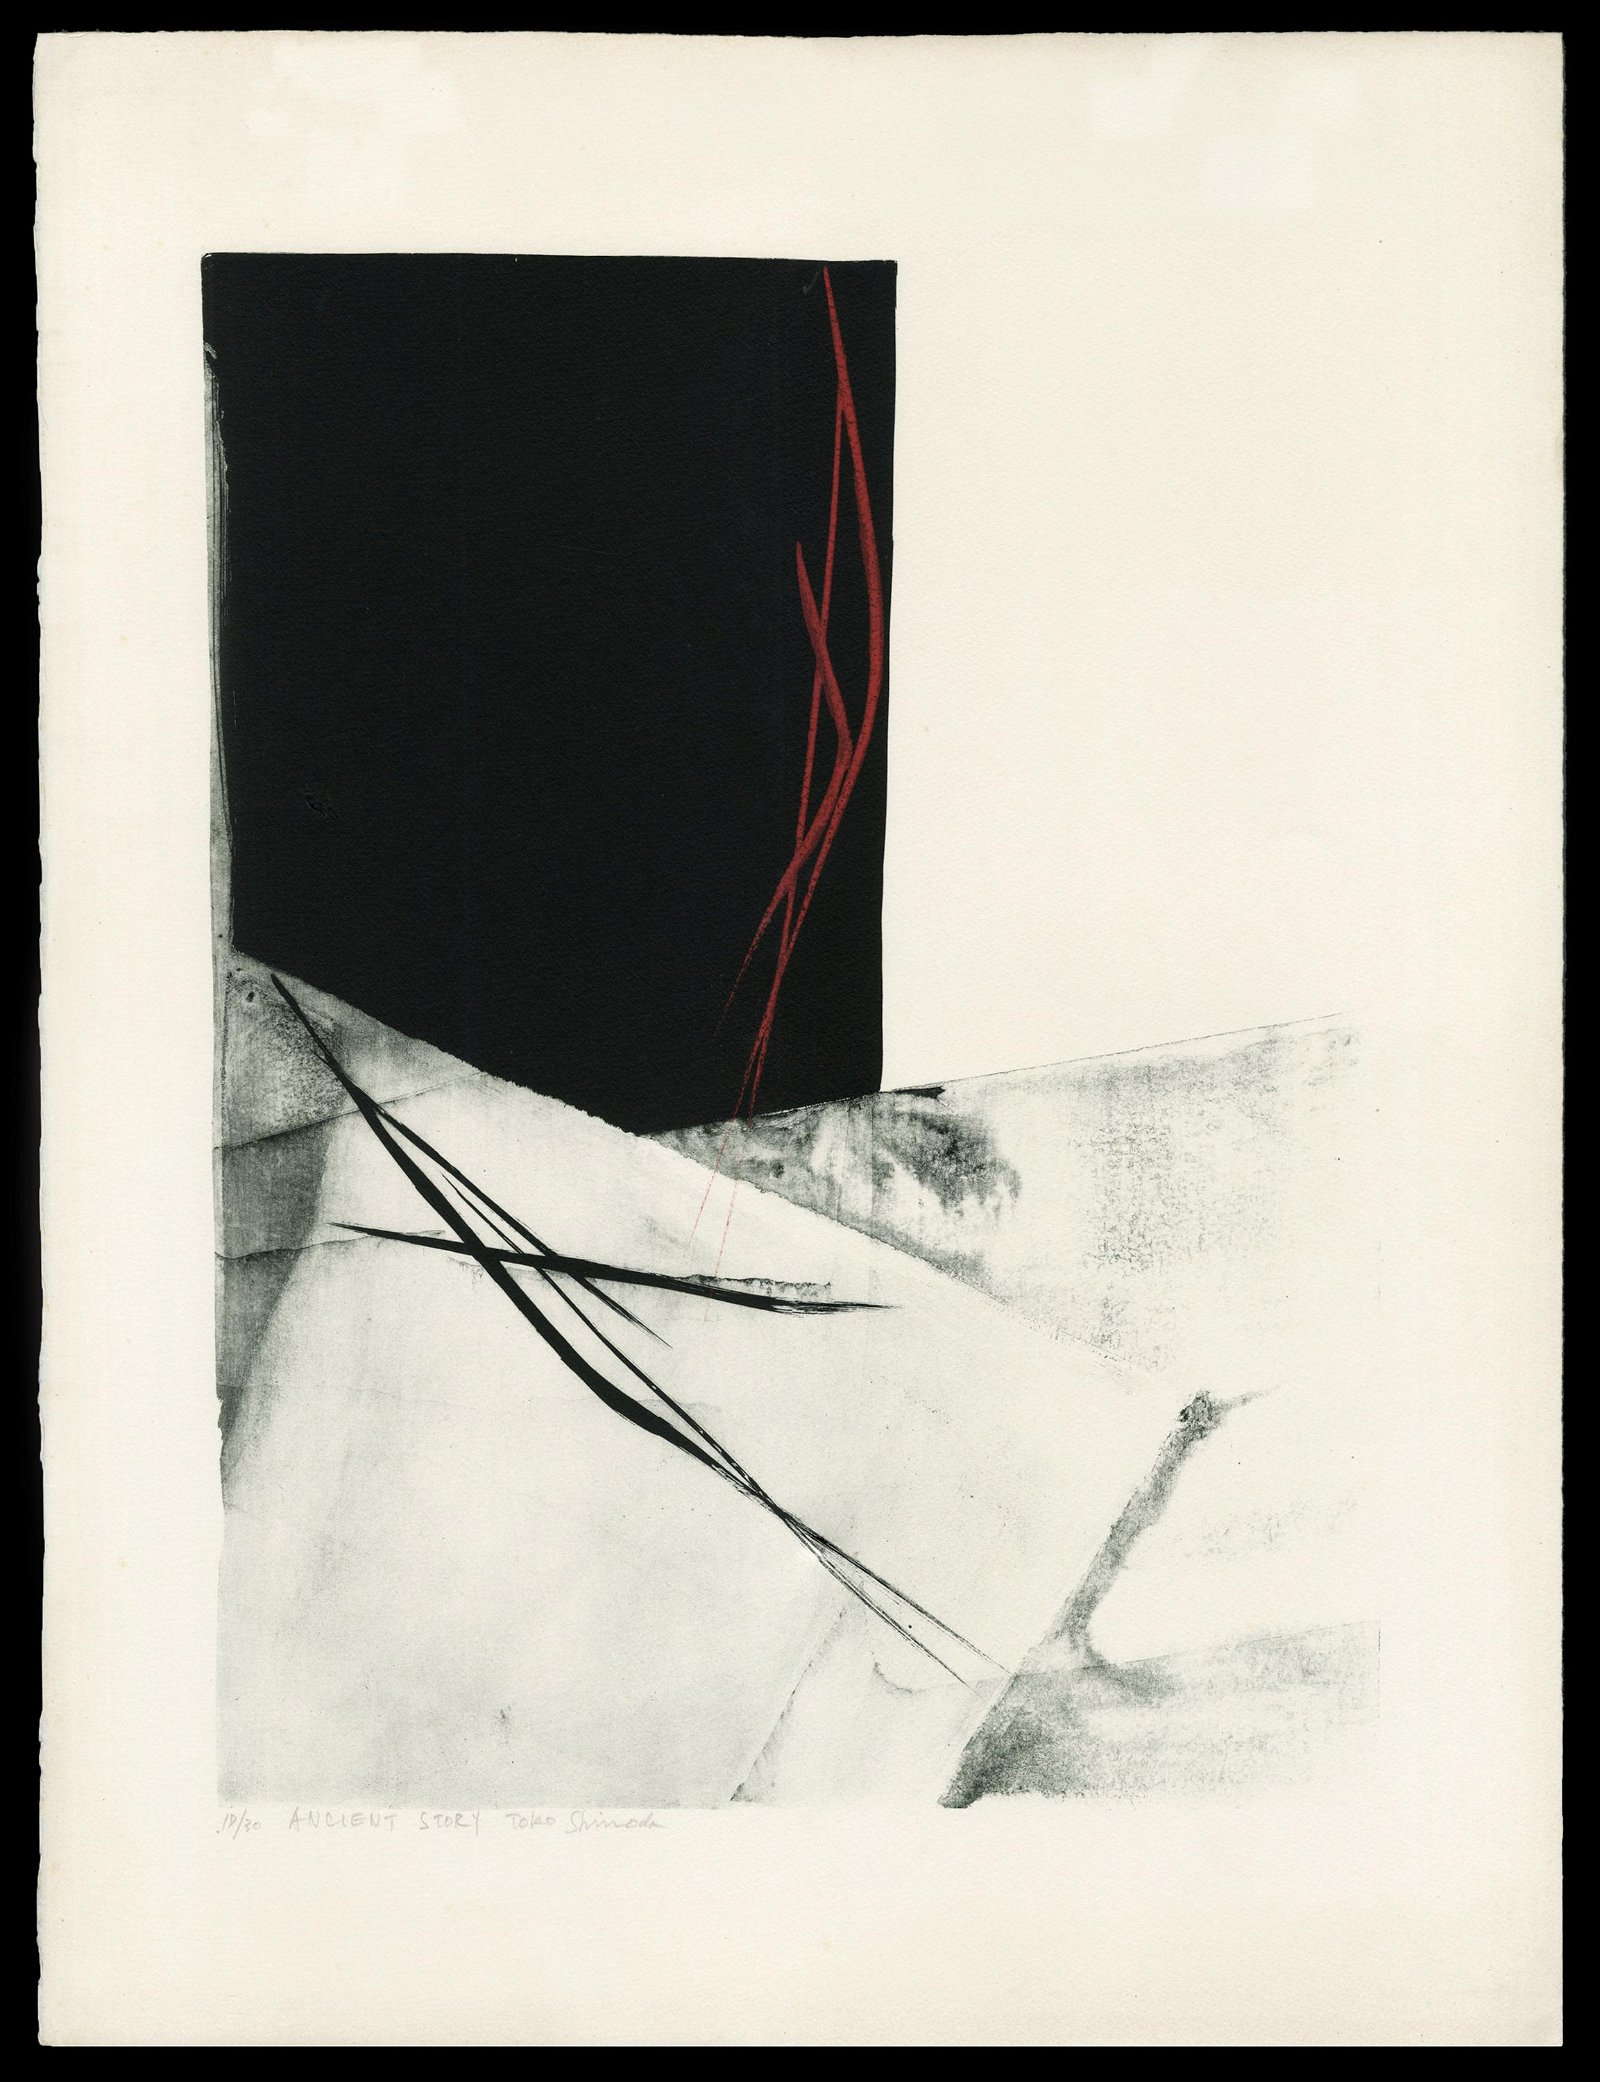 Toko Shinoda Japanese Print - Ancient Story